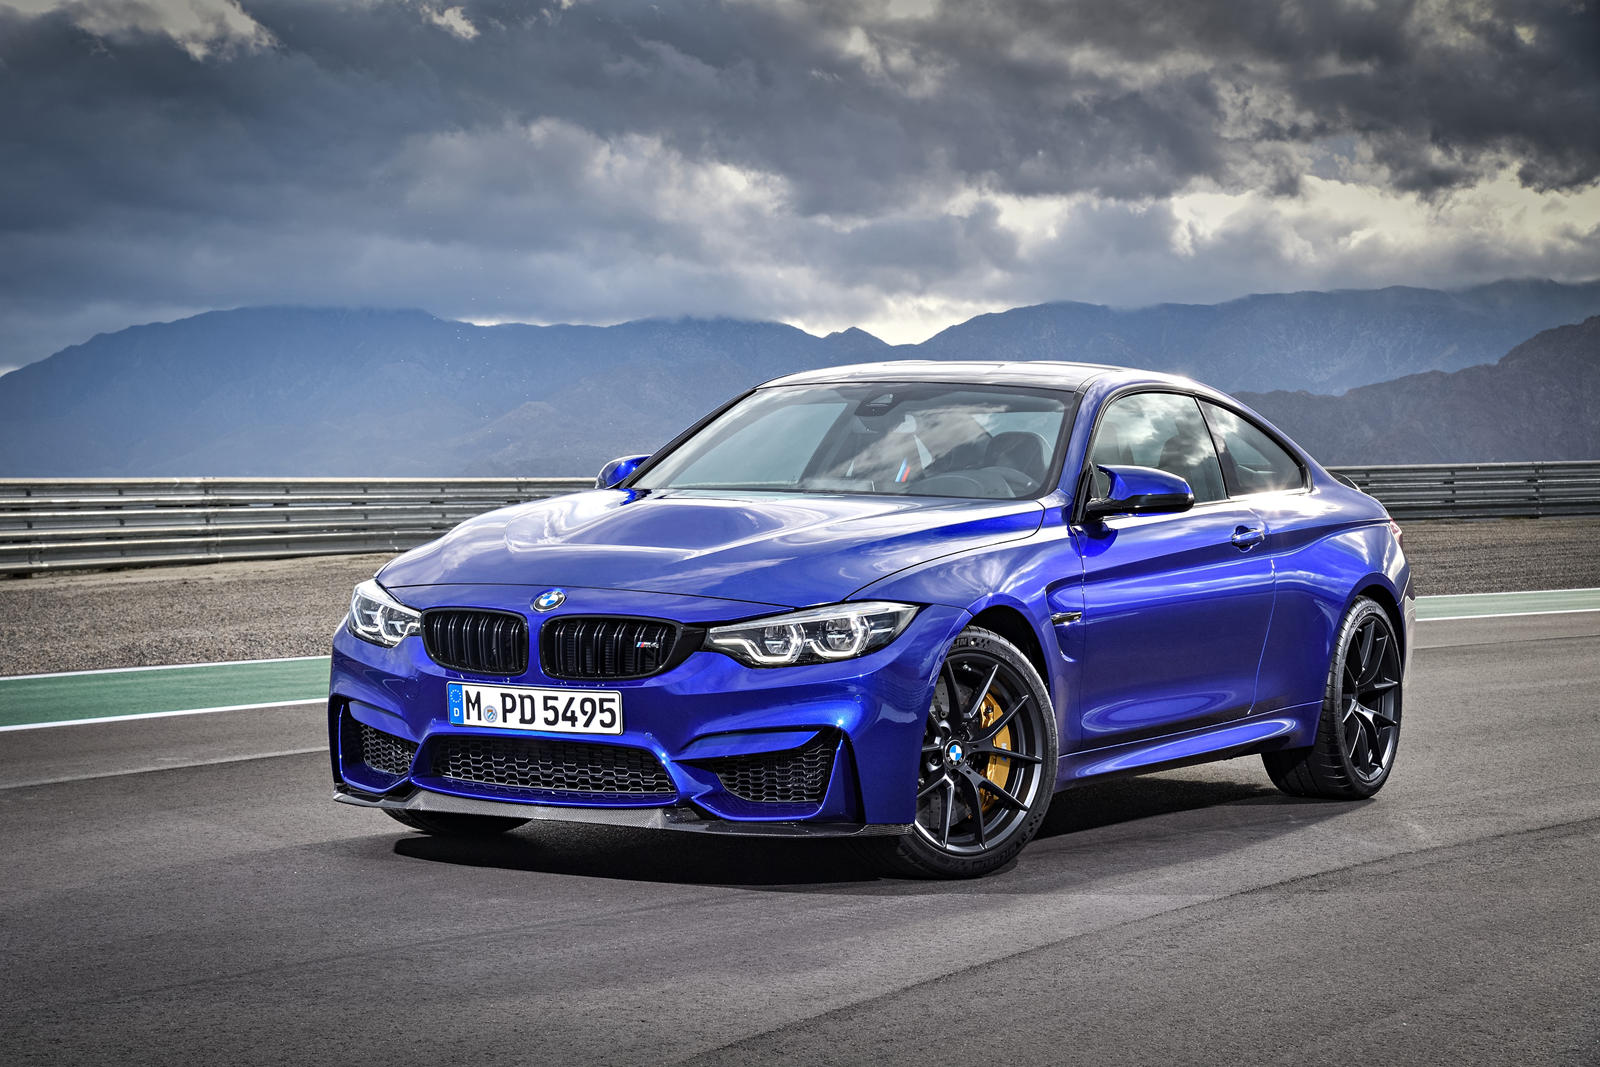 2020 BMW M4 Prices